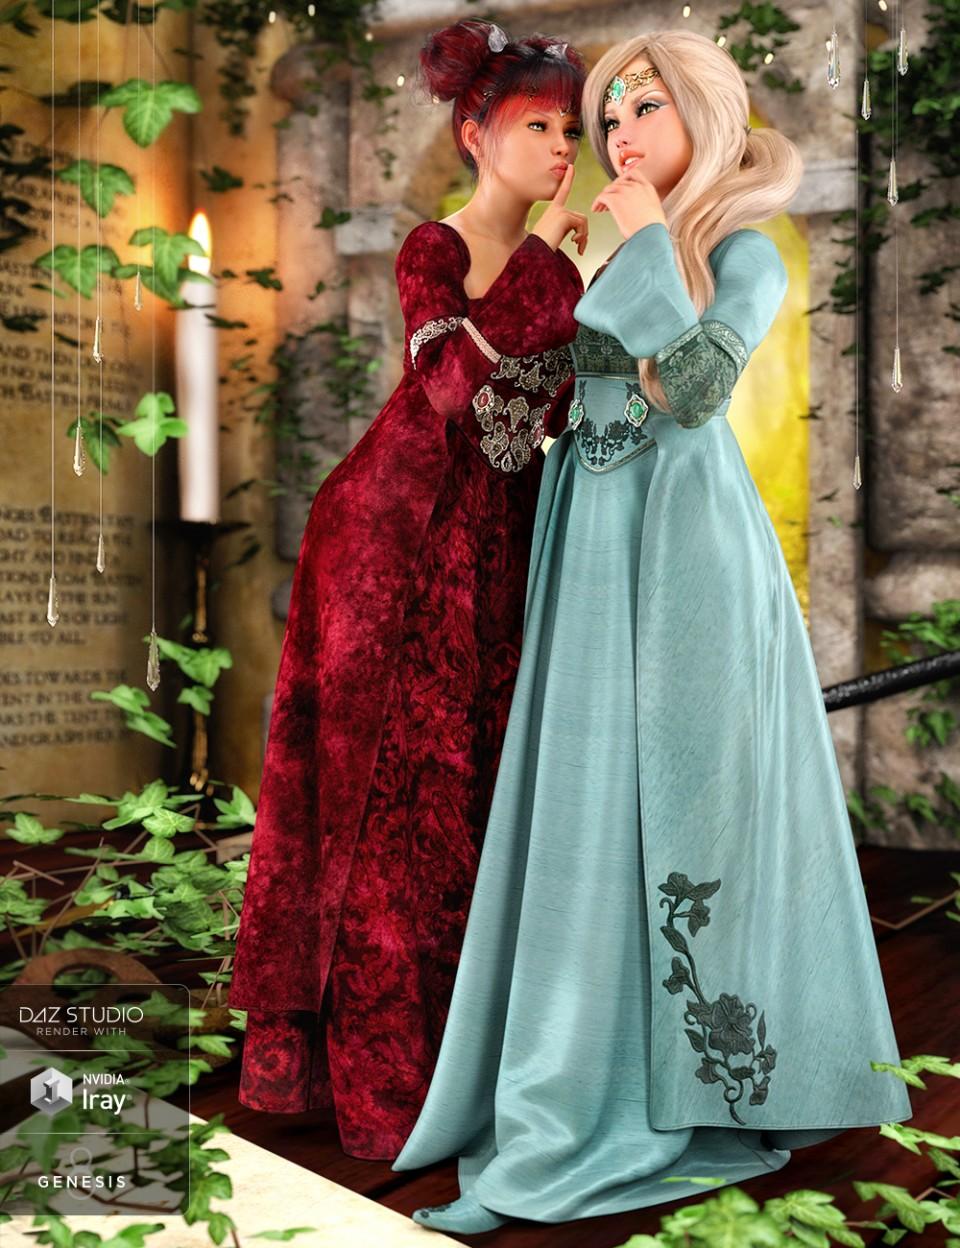 dForce Maiden Princess Outfit Textures_DAZ3D下载站